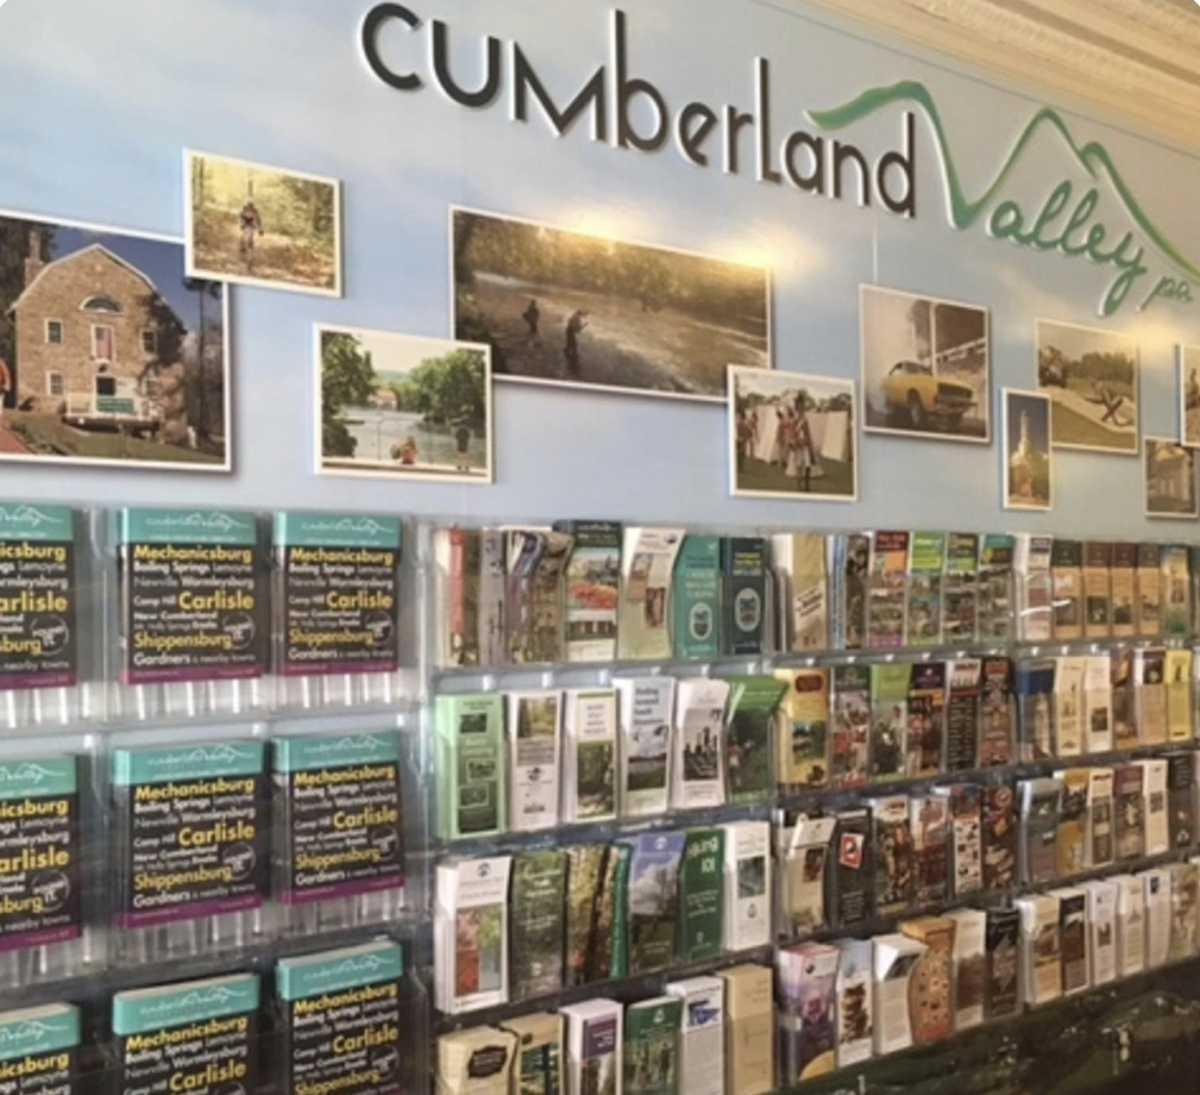 Cumberland Valley Visitor's Center